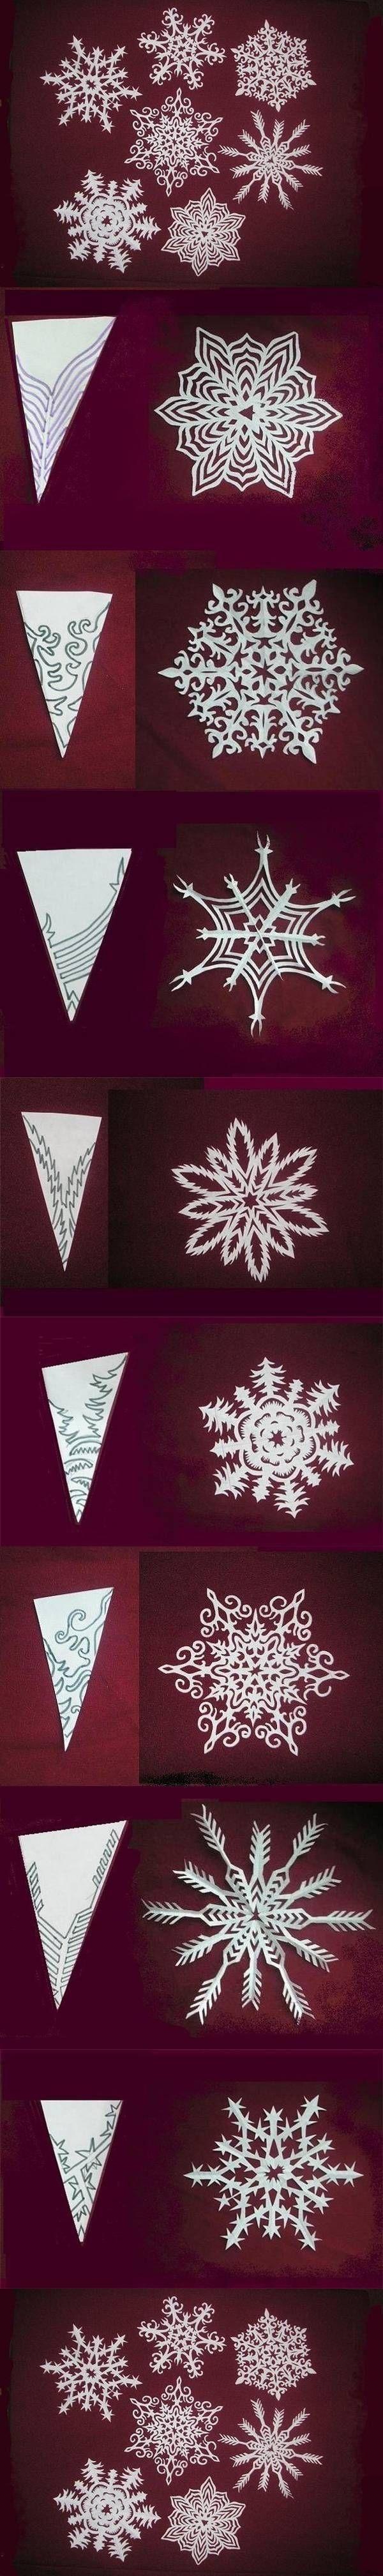 DIY Snowflakes Paper Pattern   12.03.14